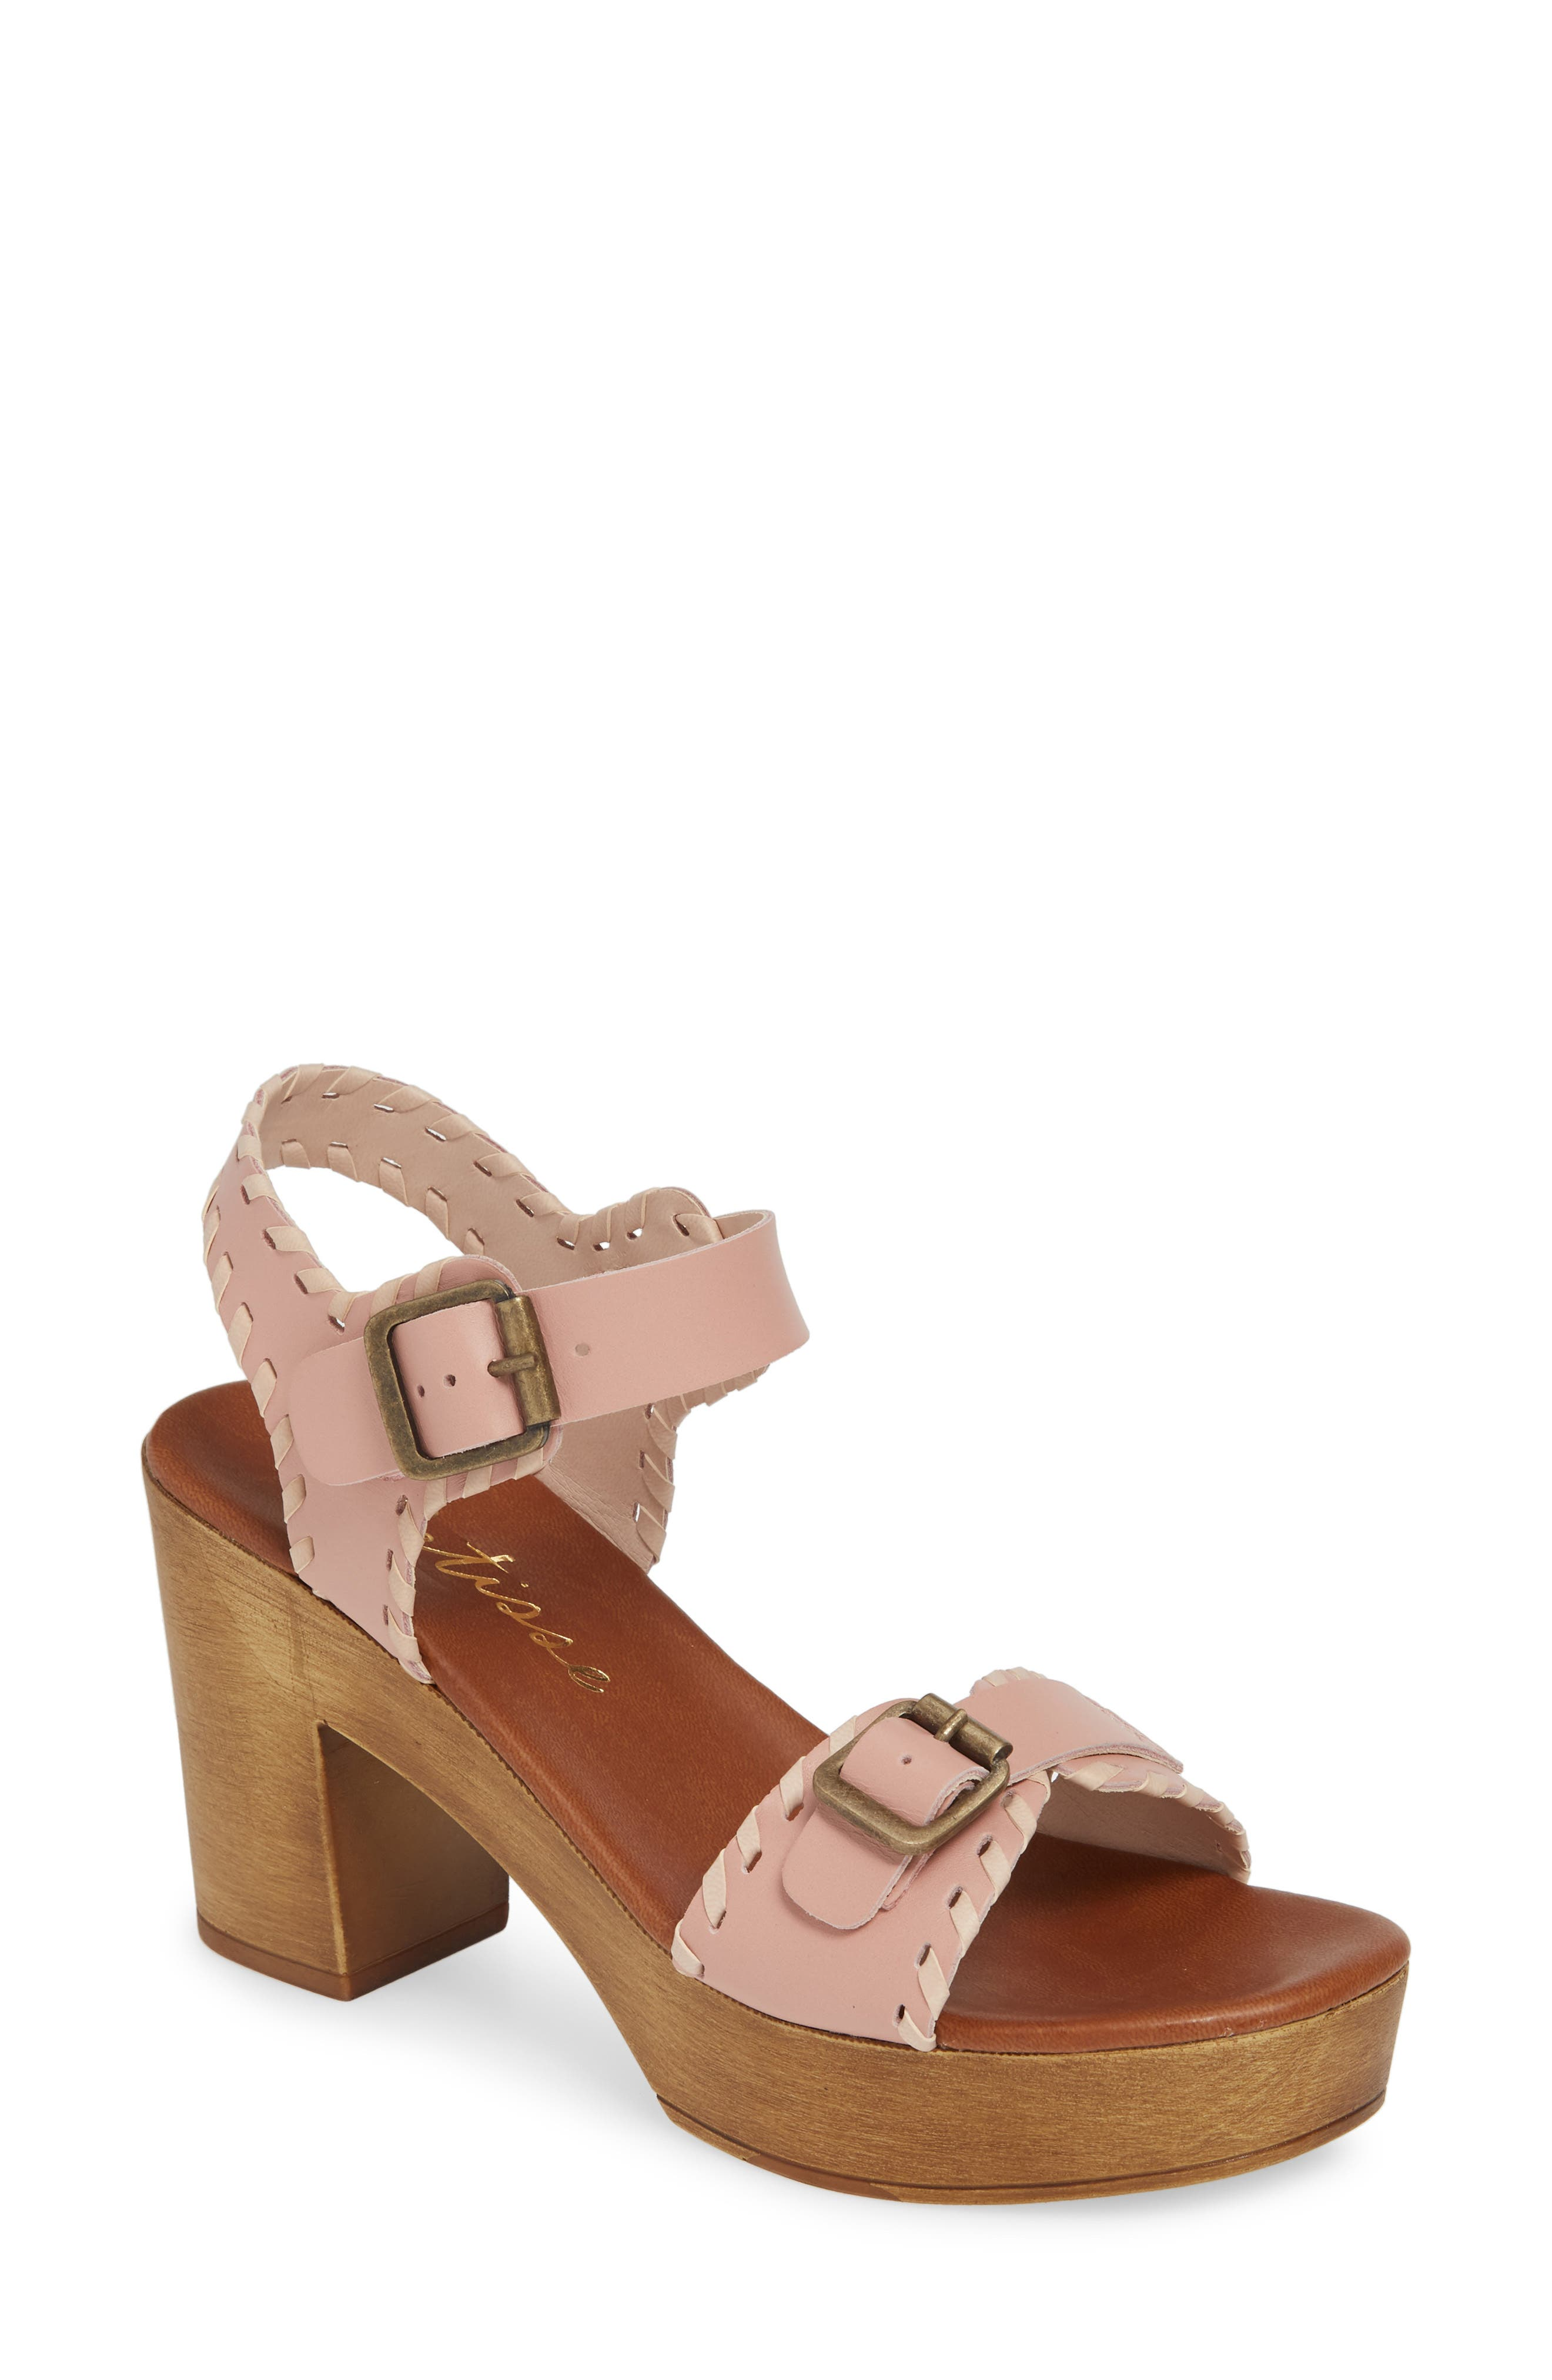 Matisse Twiggy Platform Sandal, Pink